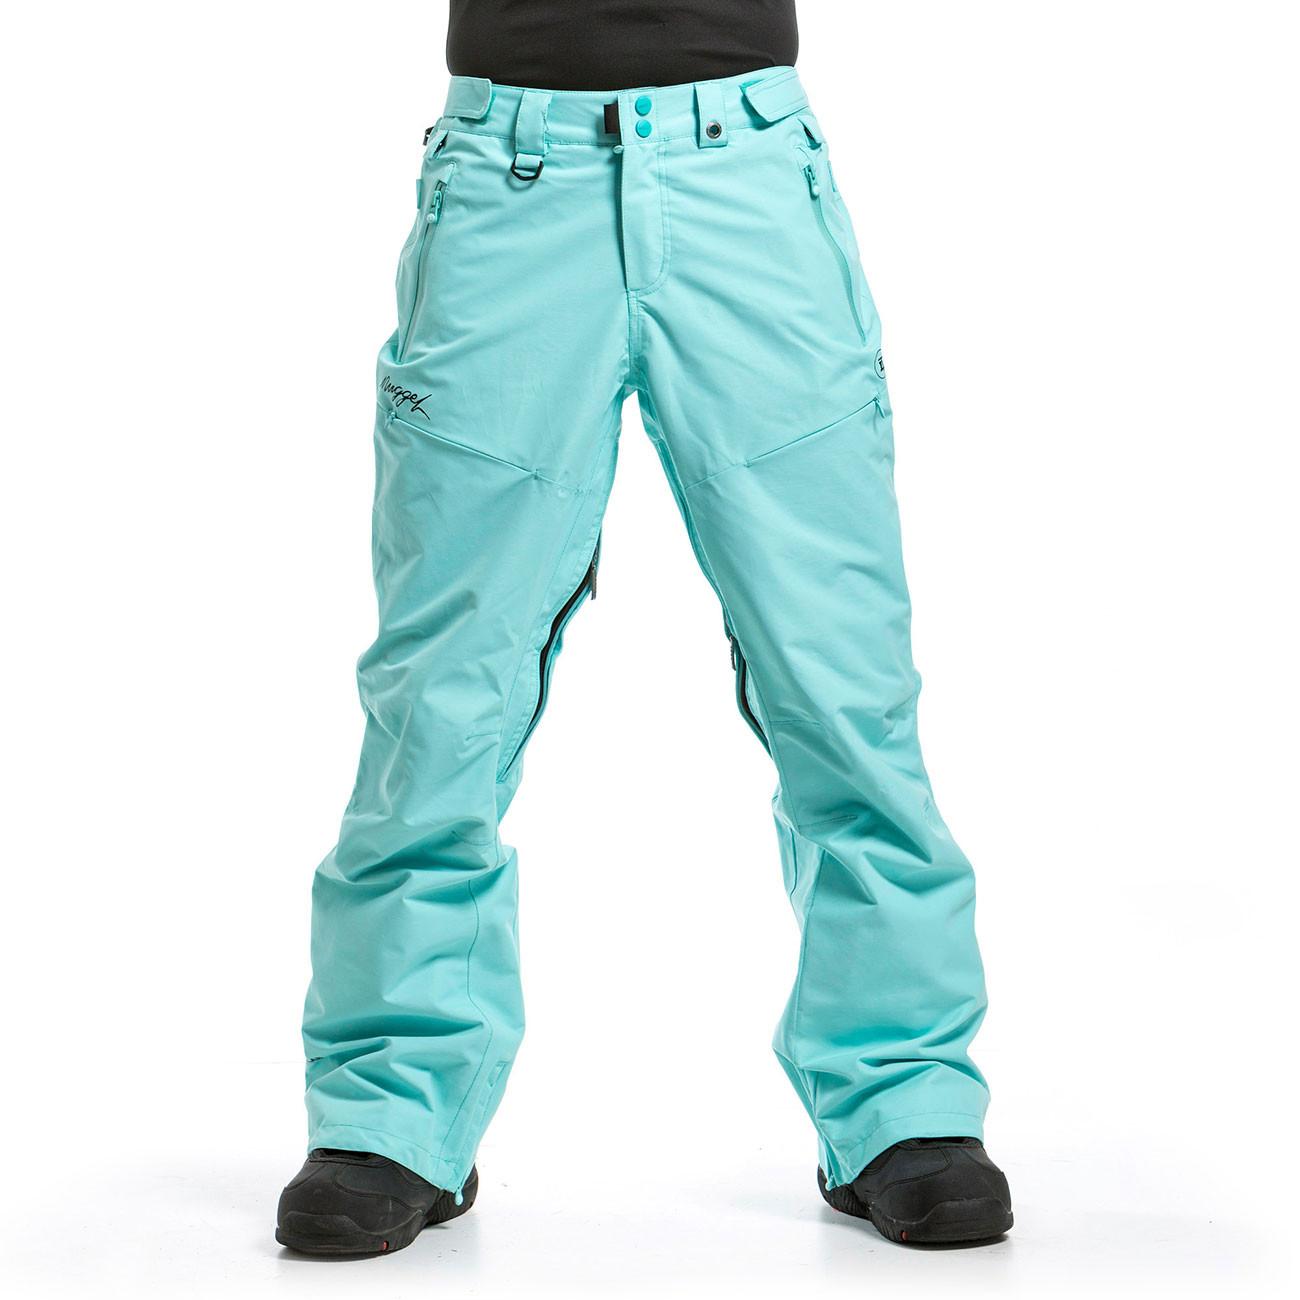 Kalhoty Nugget Vivid 3 mint